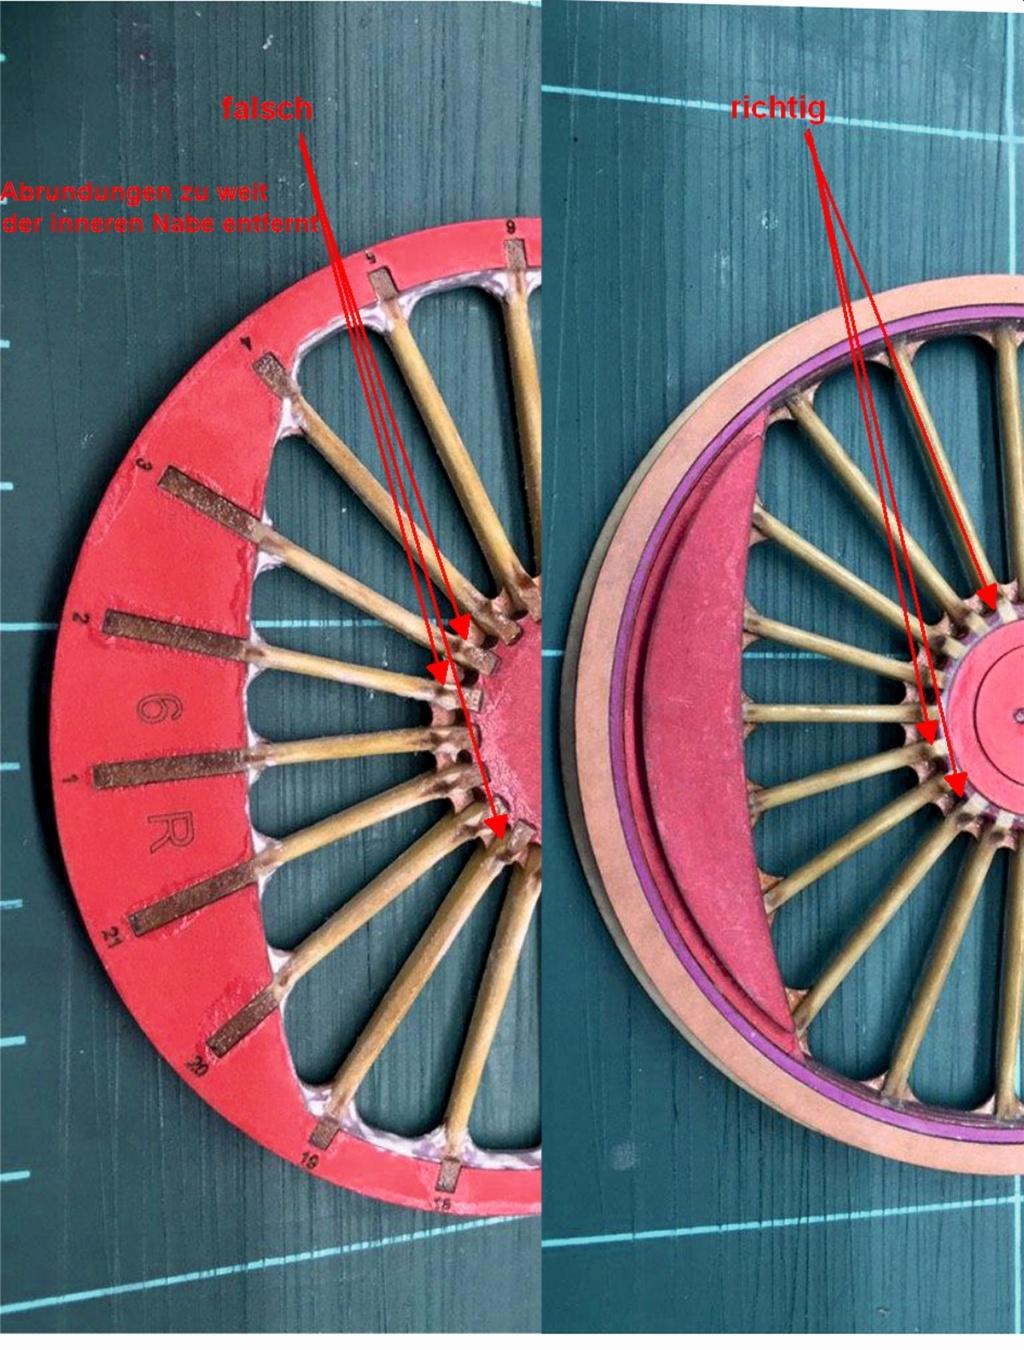 BR 03.10 auf Basis Angraf Dampflok PM3, 1:25 - Seite 3 Rad_ve10